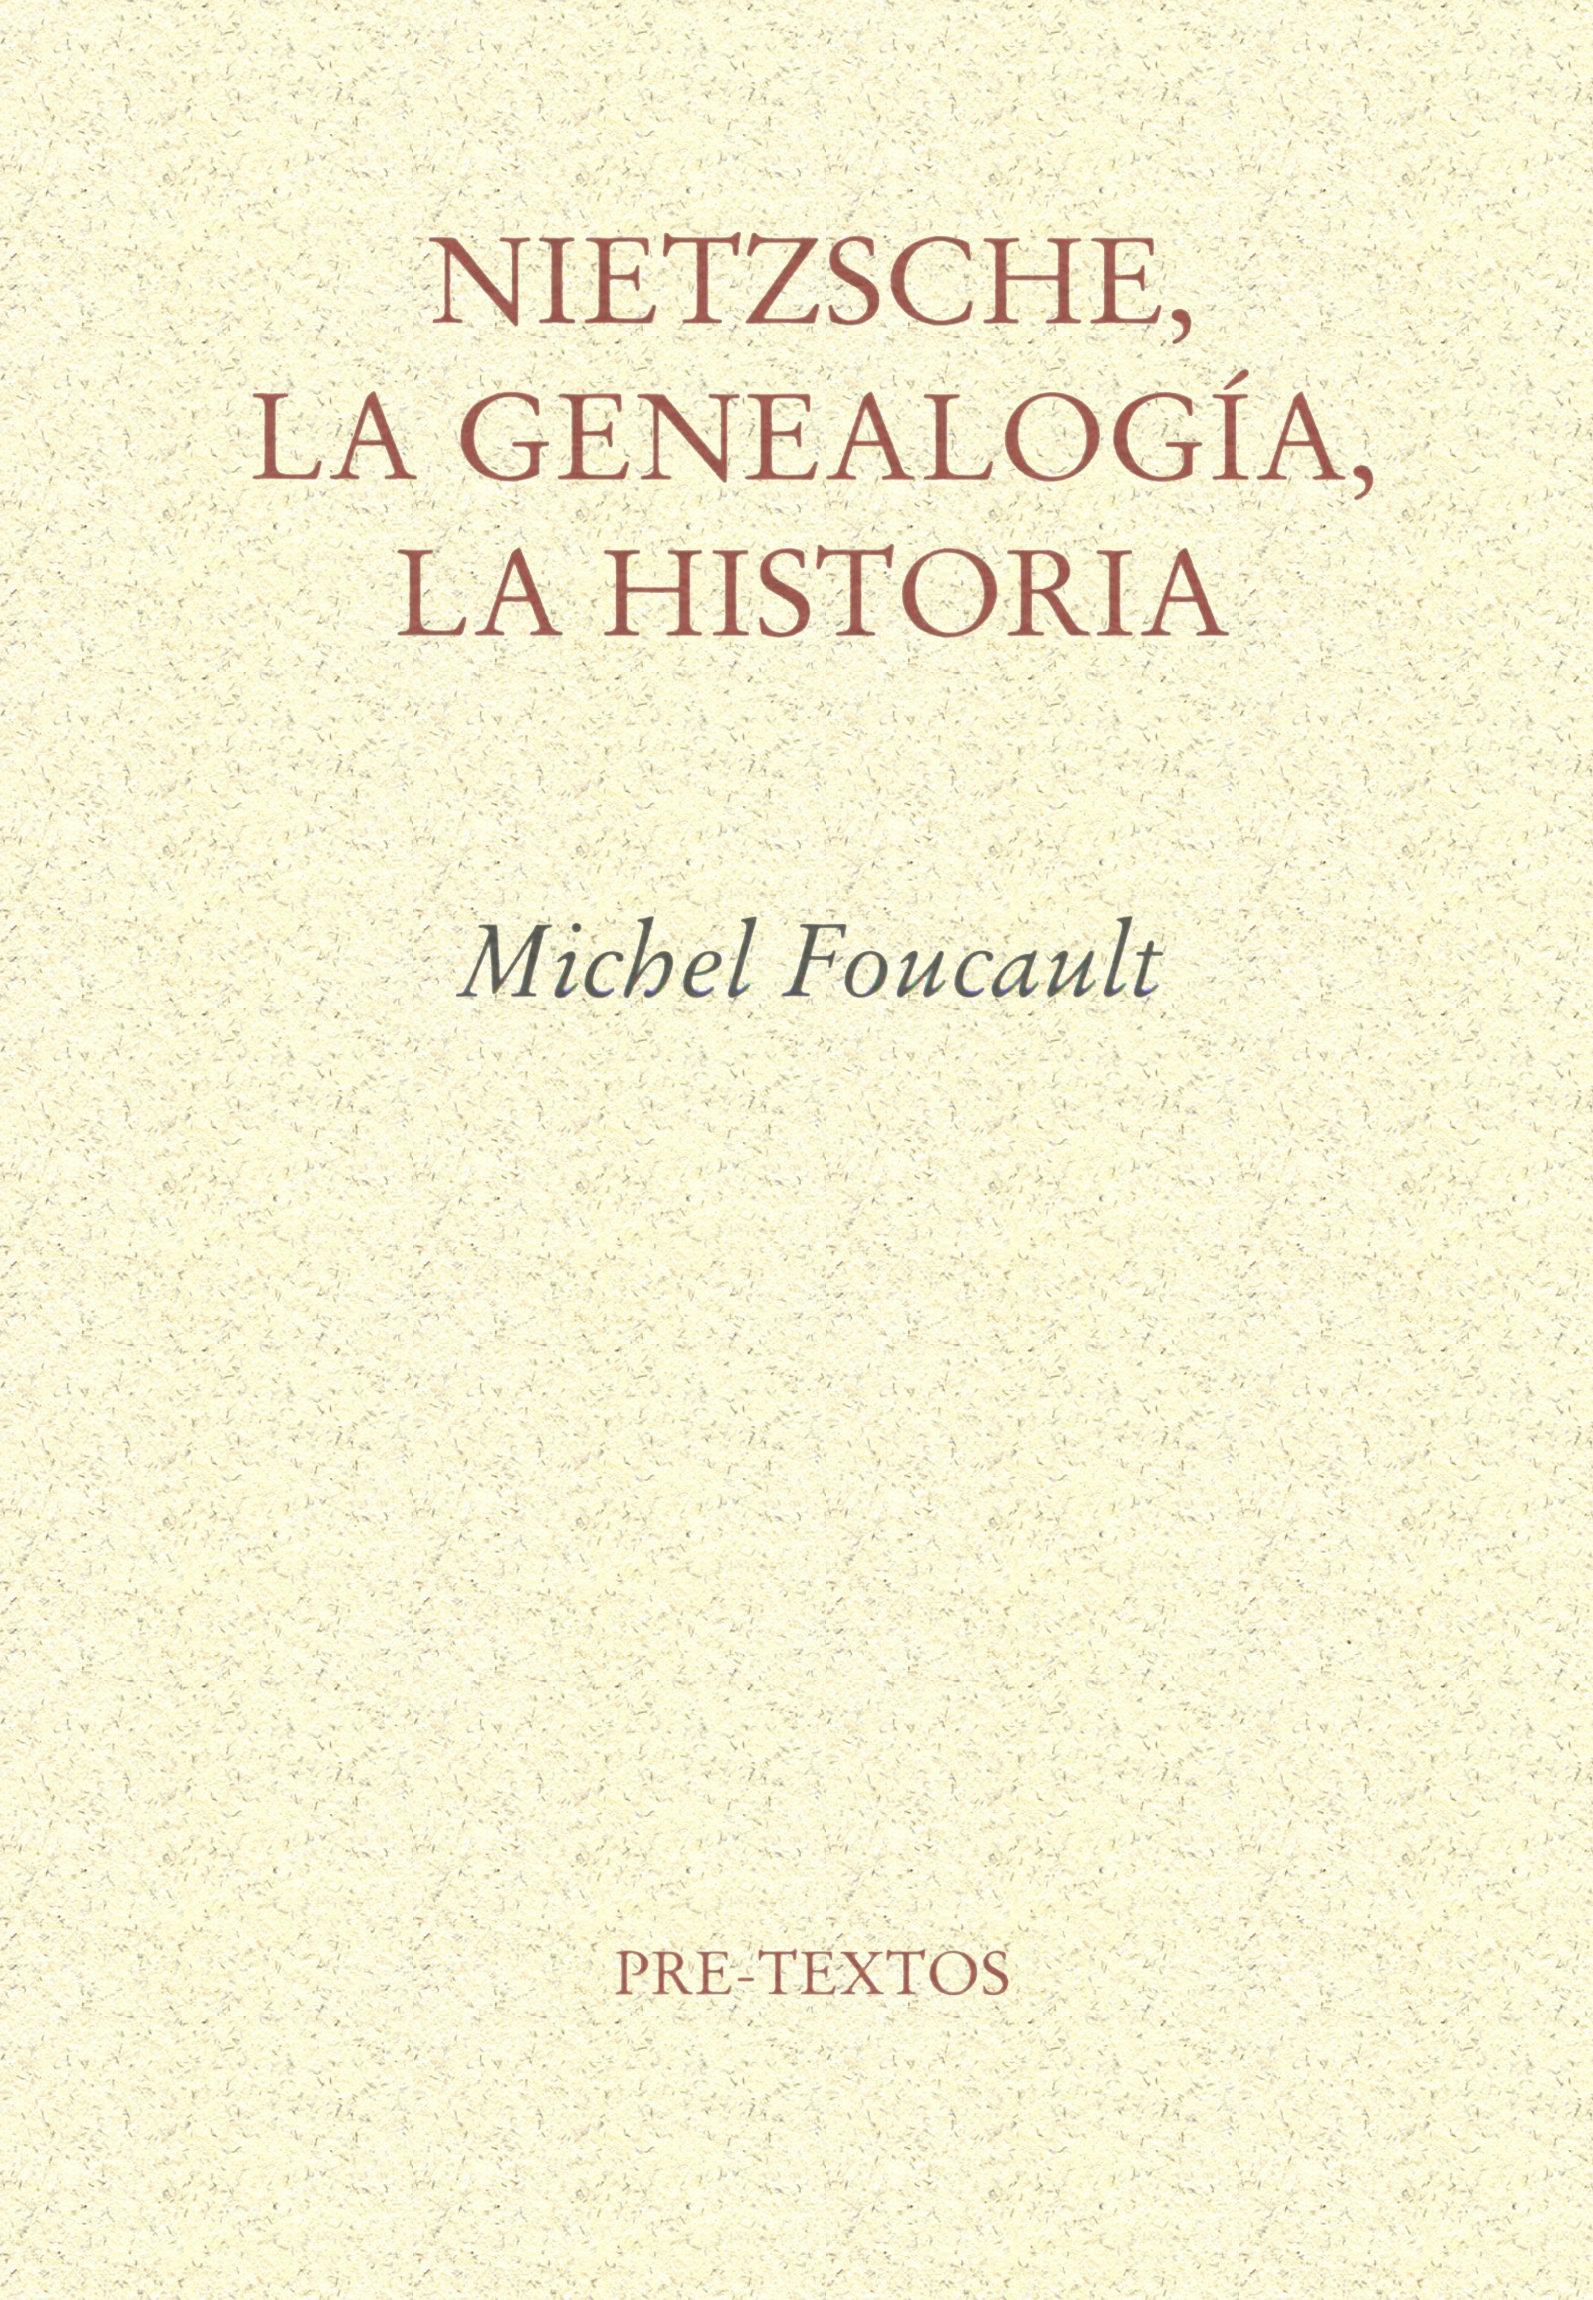 Nietzsche, La Genealogia, La Historia por Michel Foucault